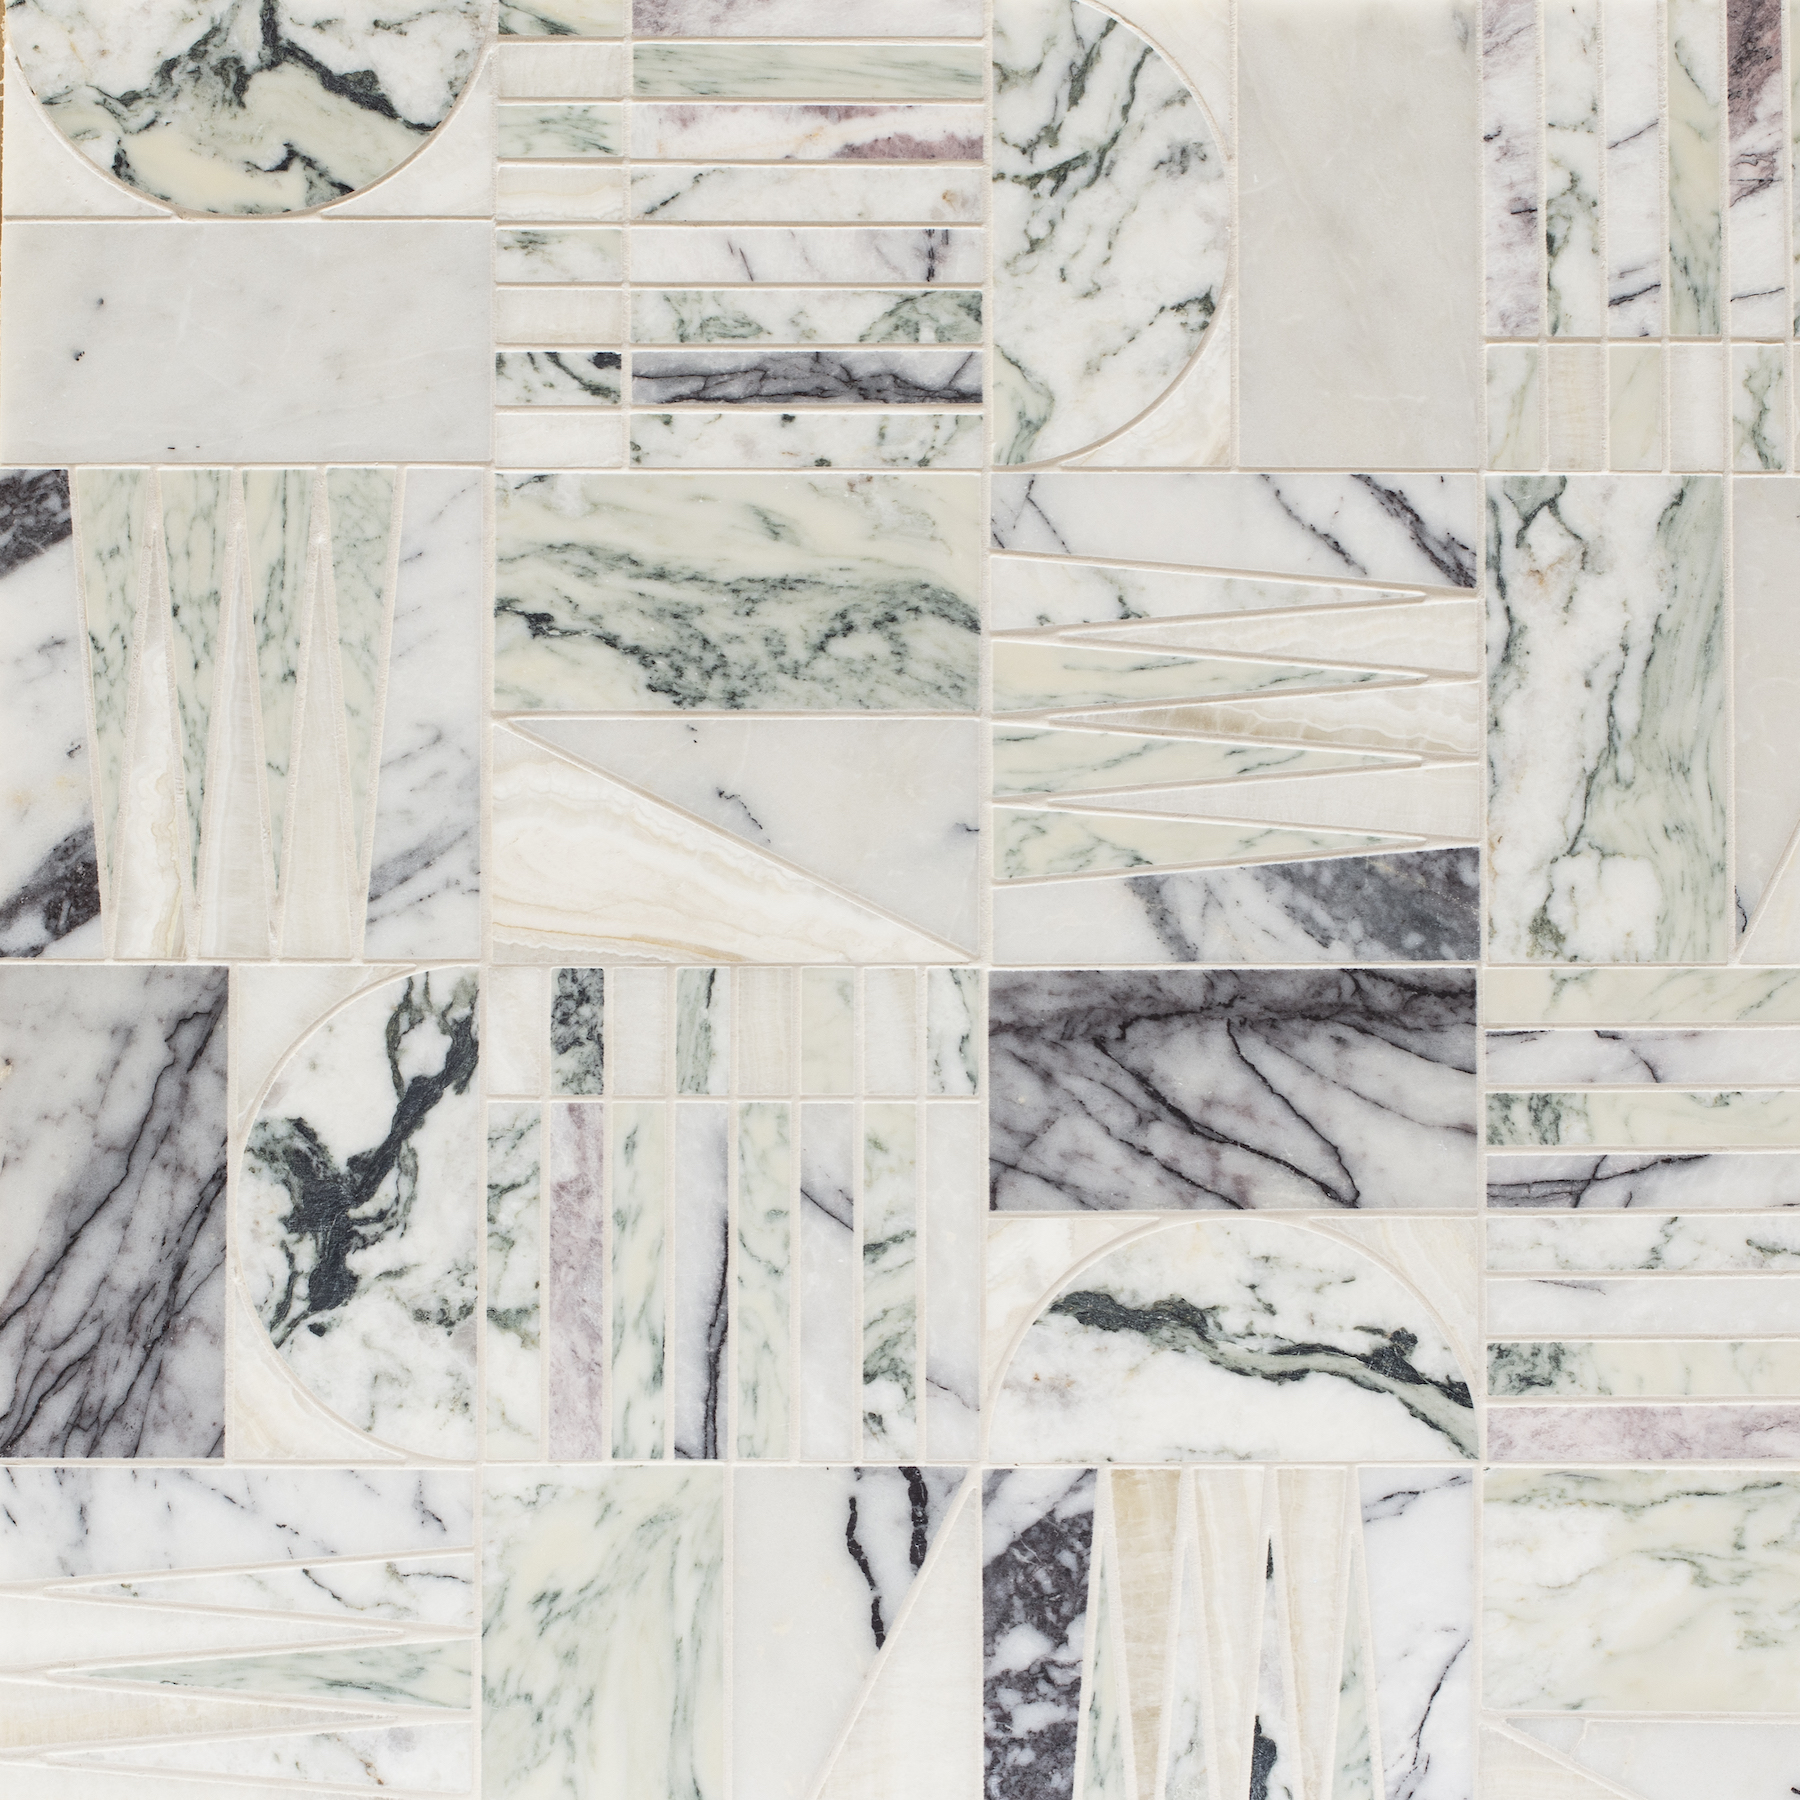 alison-rose-euclid-artistic-tile-04